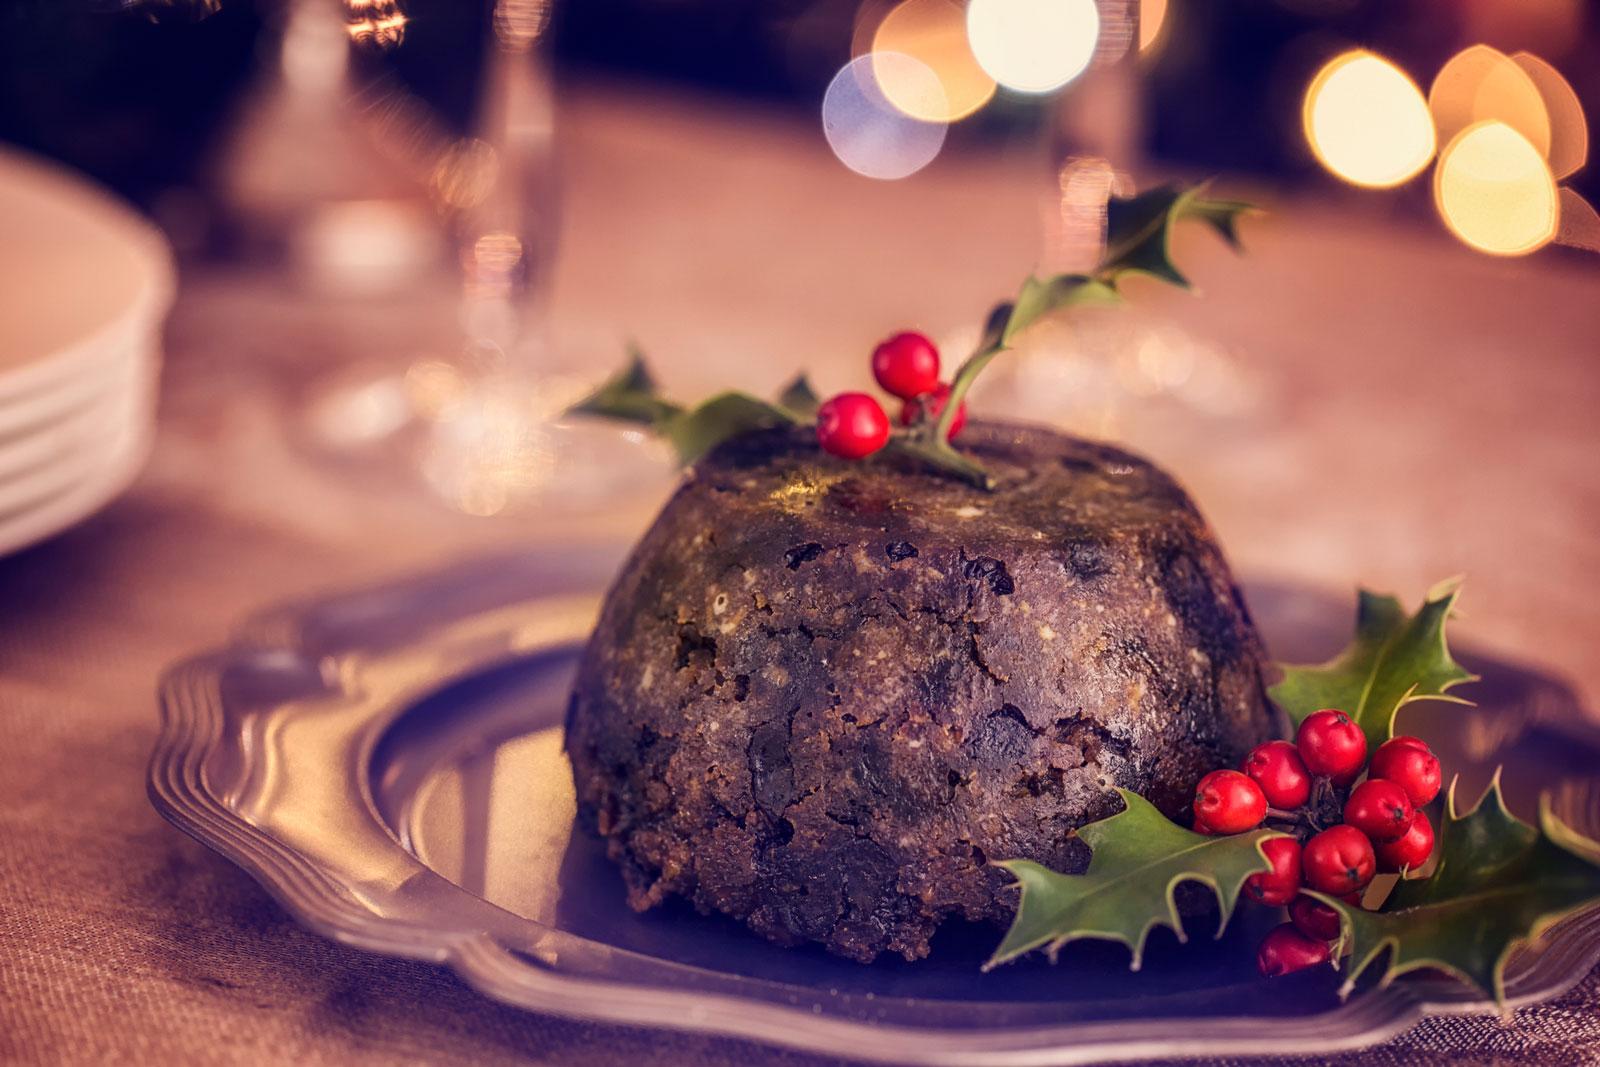 Trockenobst: In Großbritannien hat der Christmas Pudding Tradition.